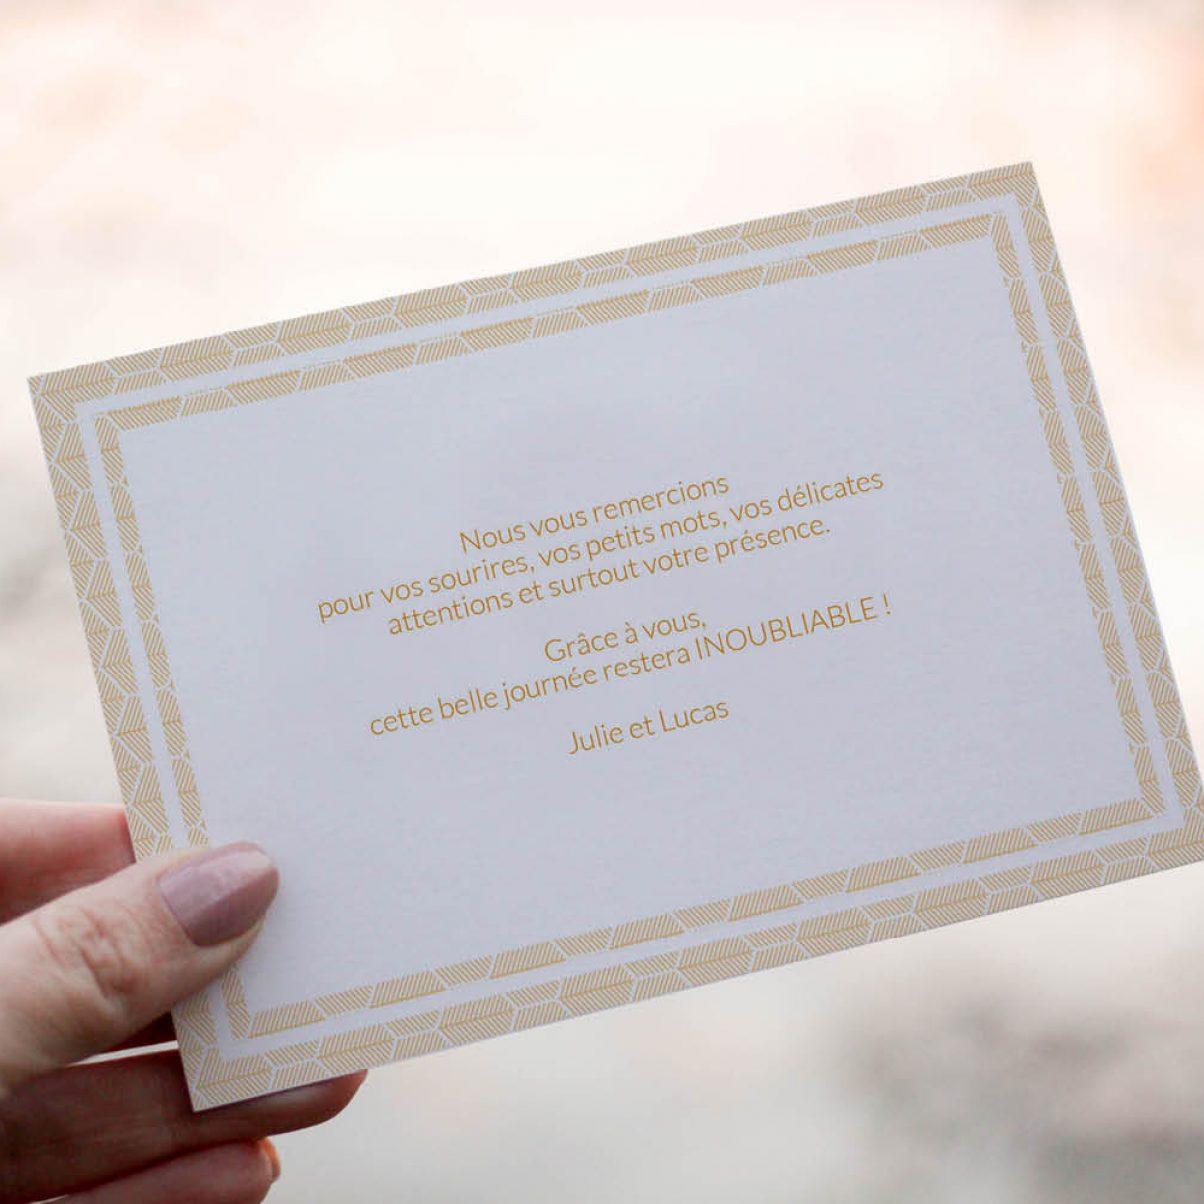 Le carton de remerciements du mariage de Claire & Lucas - verso